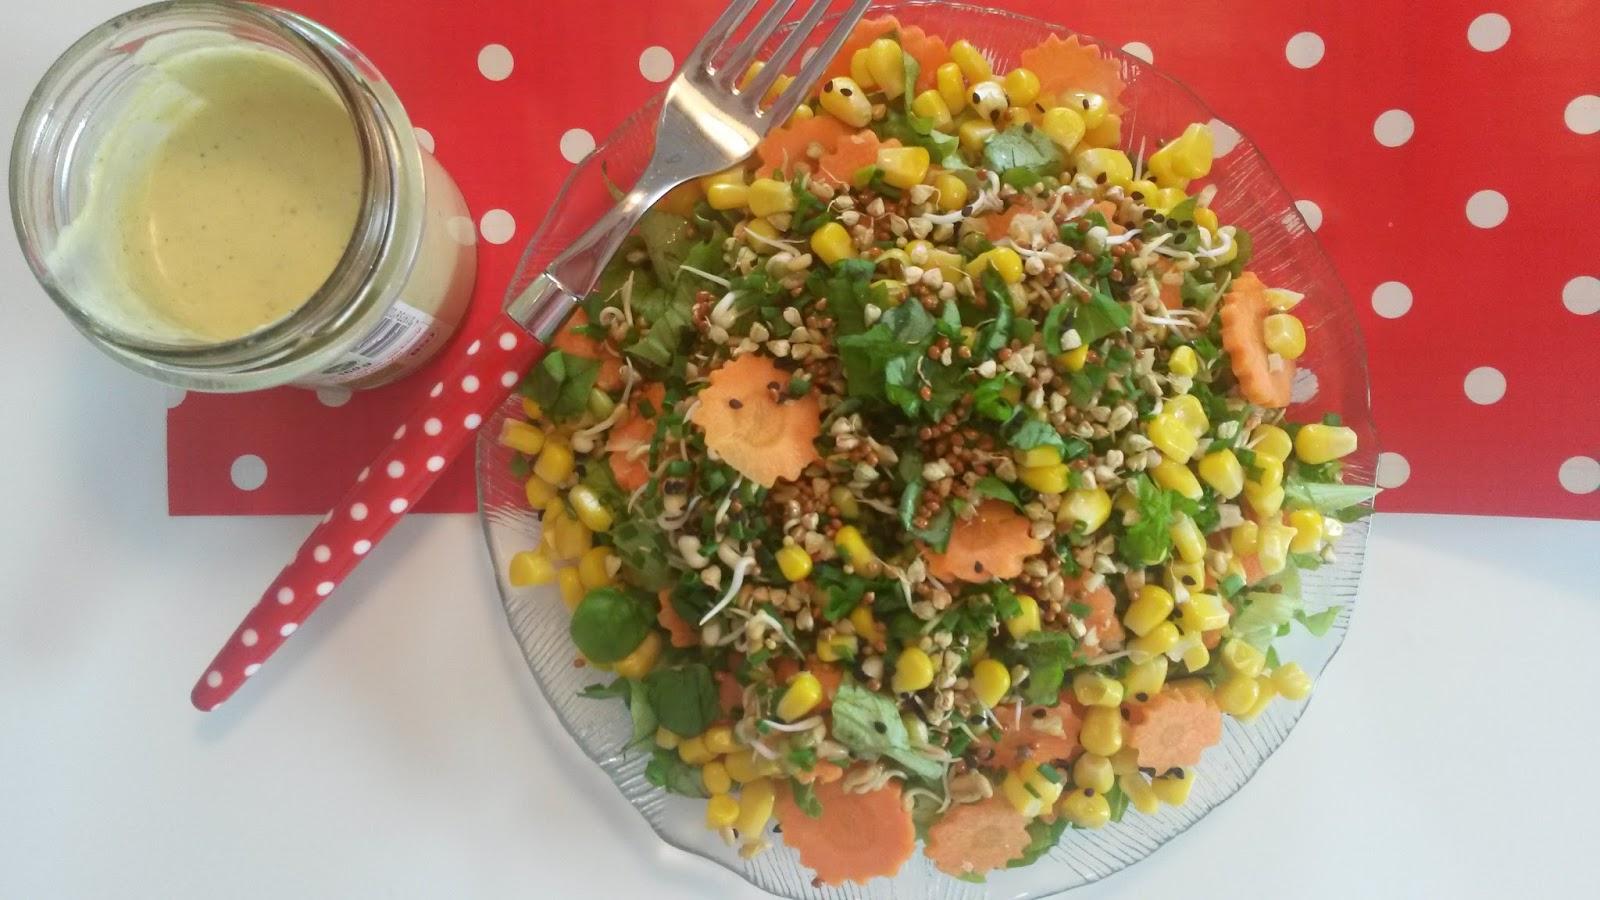 selbstgemachte Salatsoße